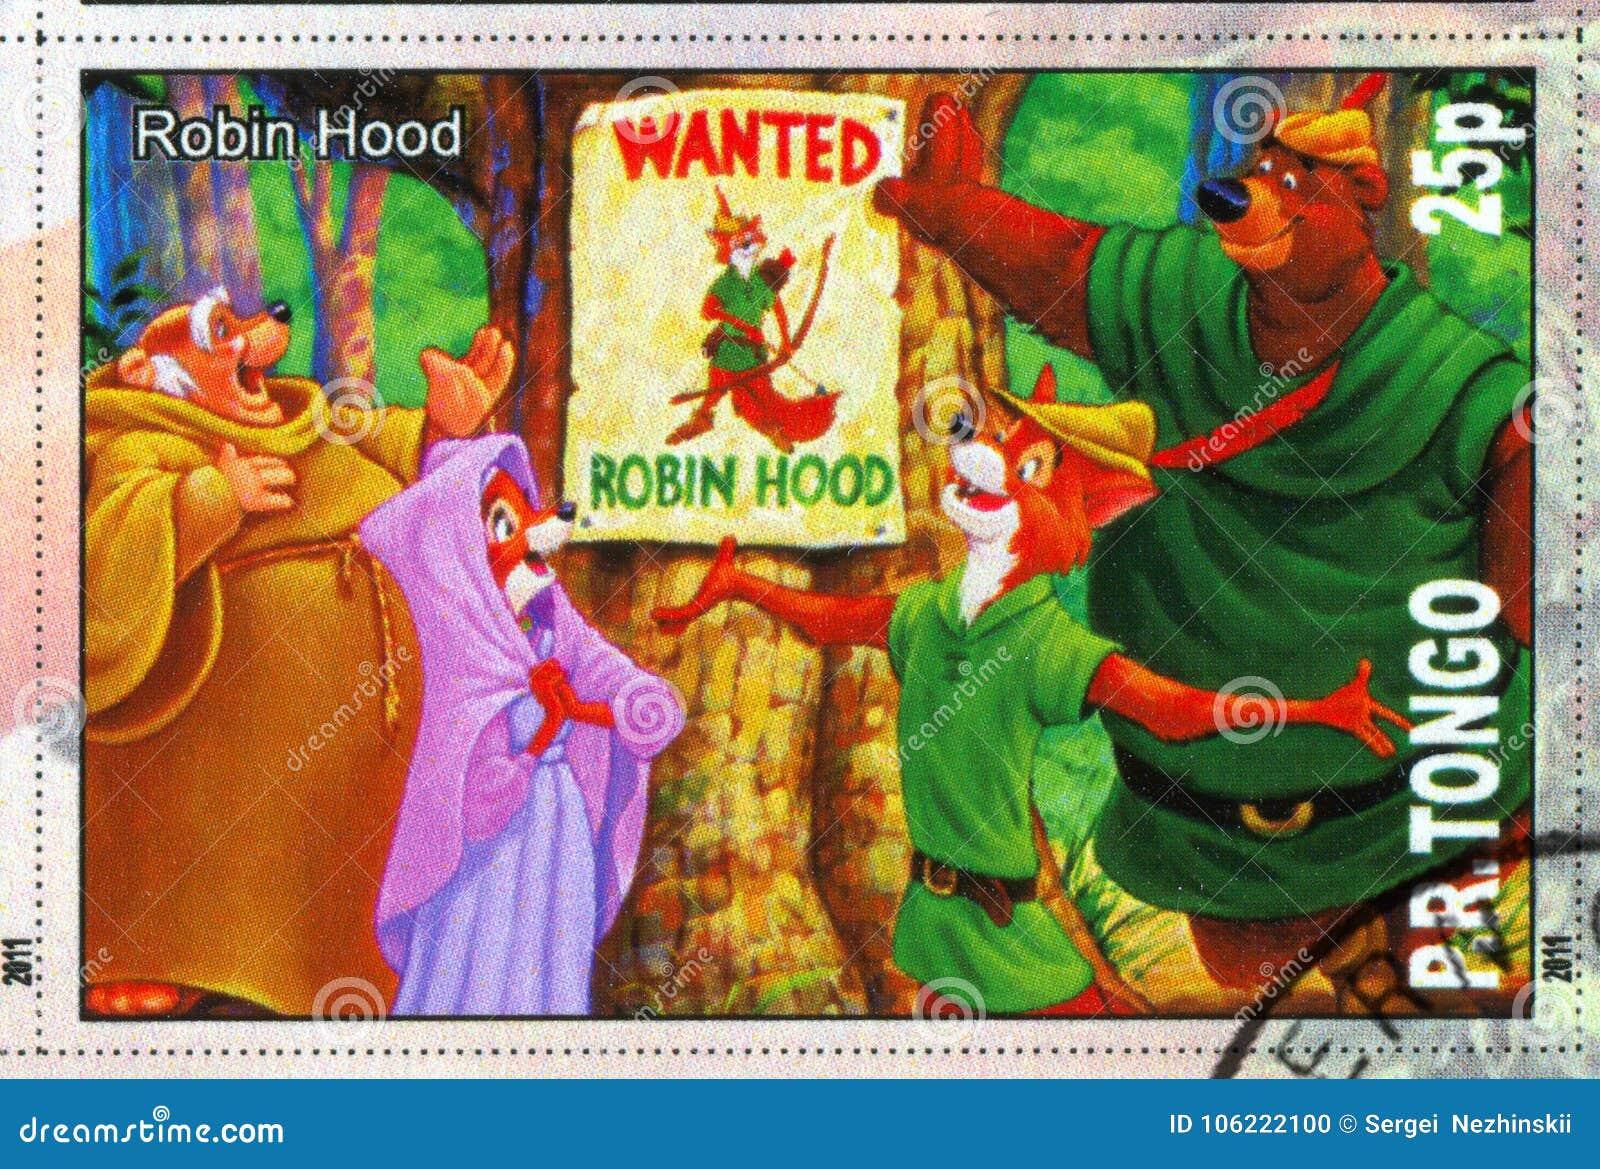 Robin Hood Editorial Image Image Of Philately Postcard 106222100